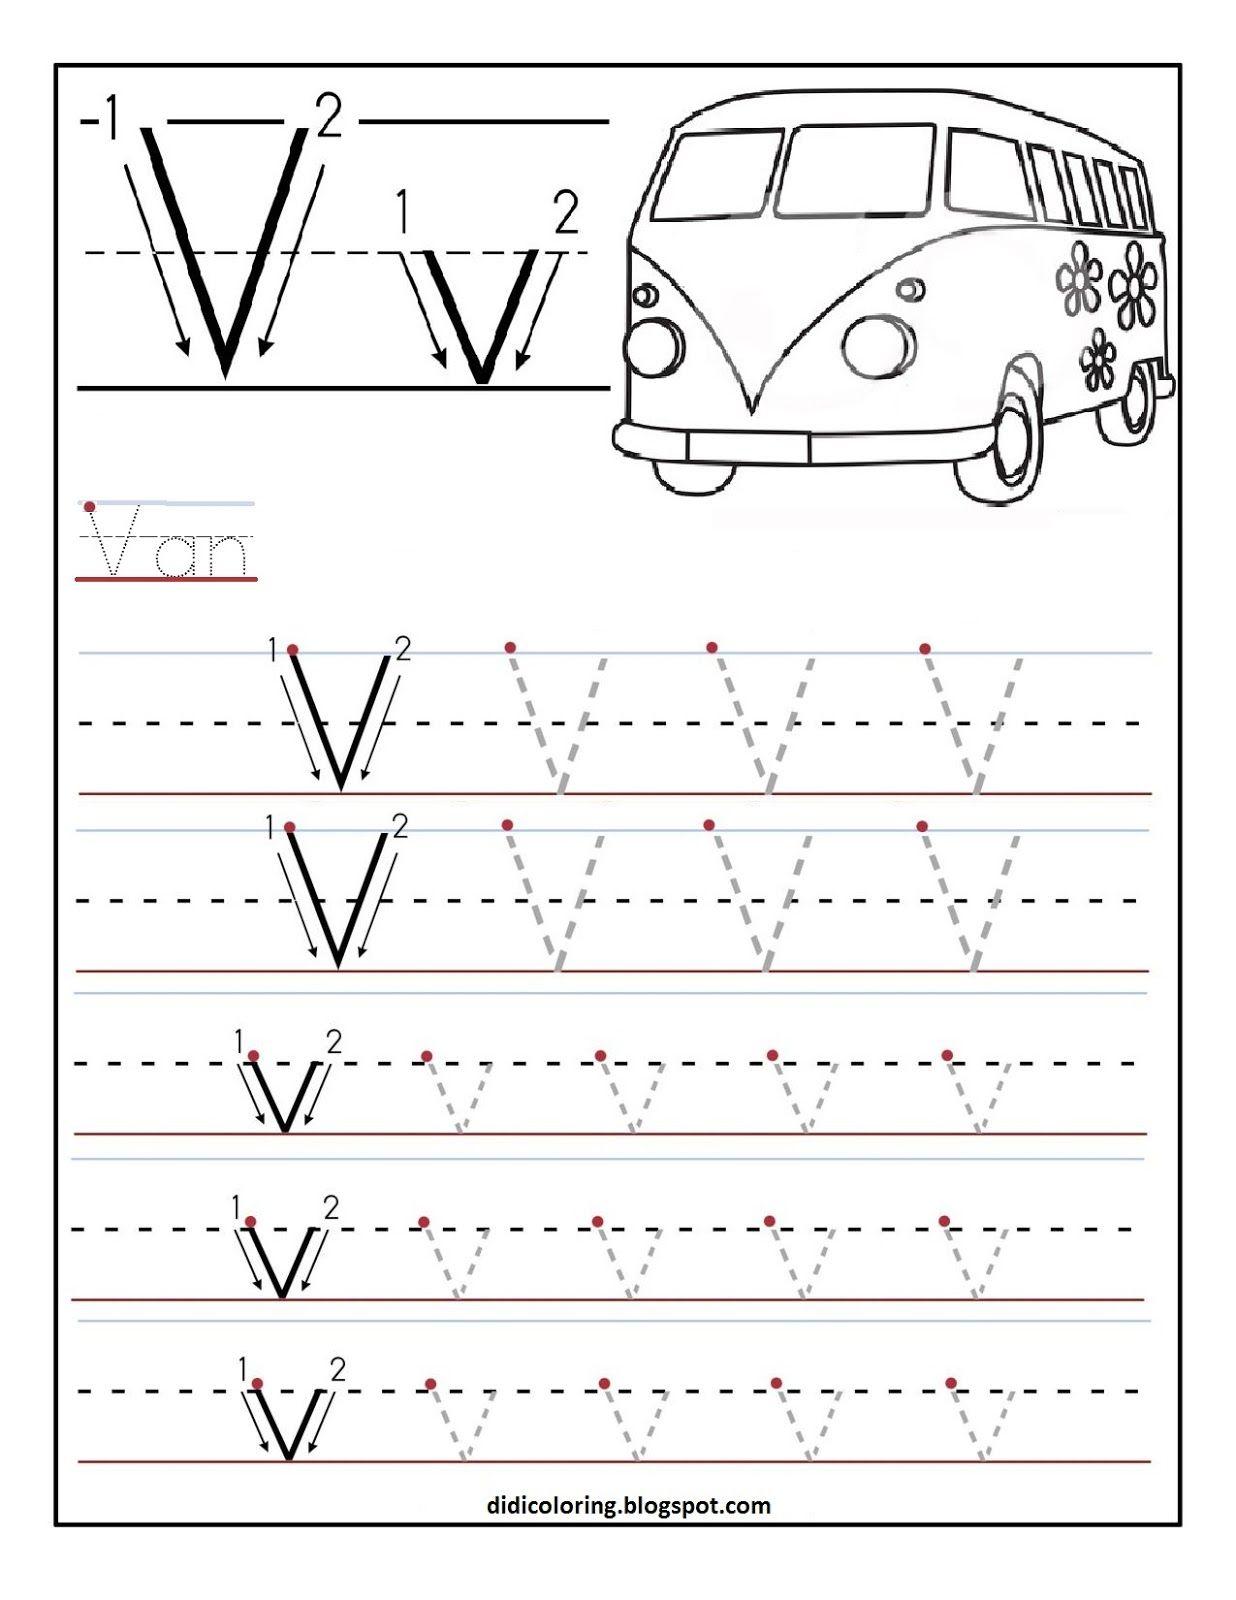 Free Printable Worksheet Letter V For Your Child To Learn inside Letter V Worksheets For Toddlers